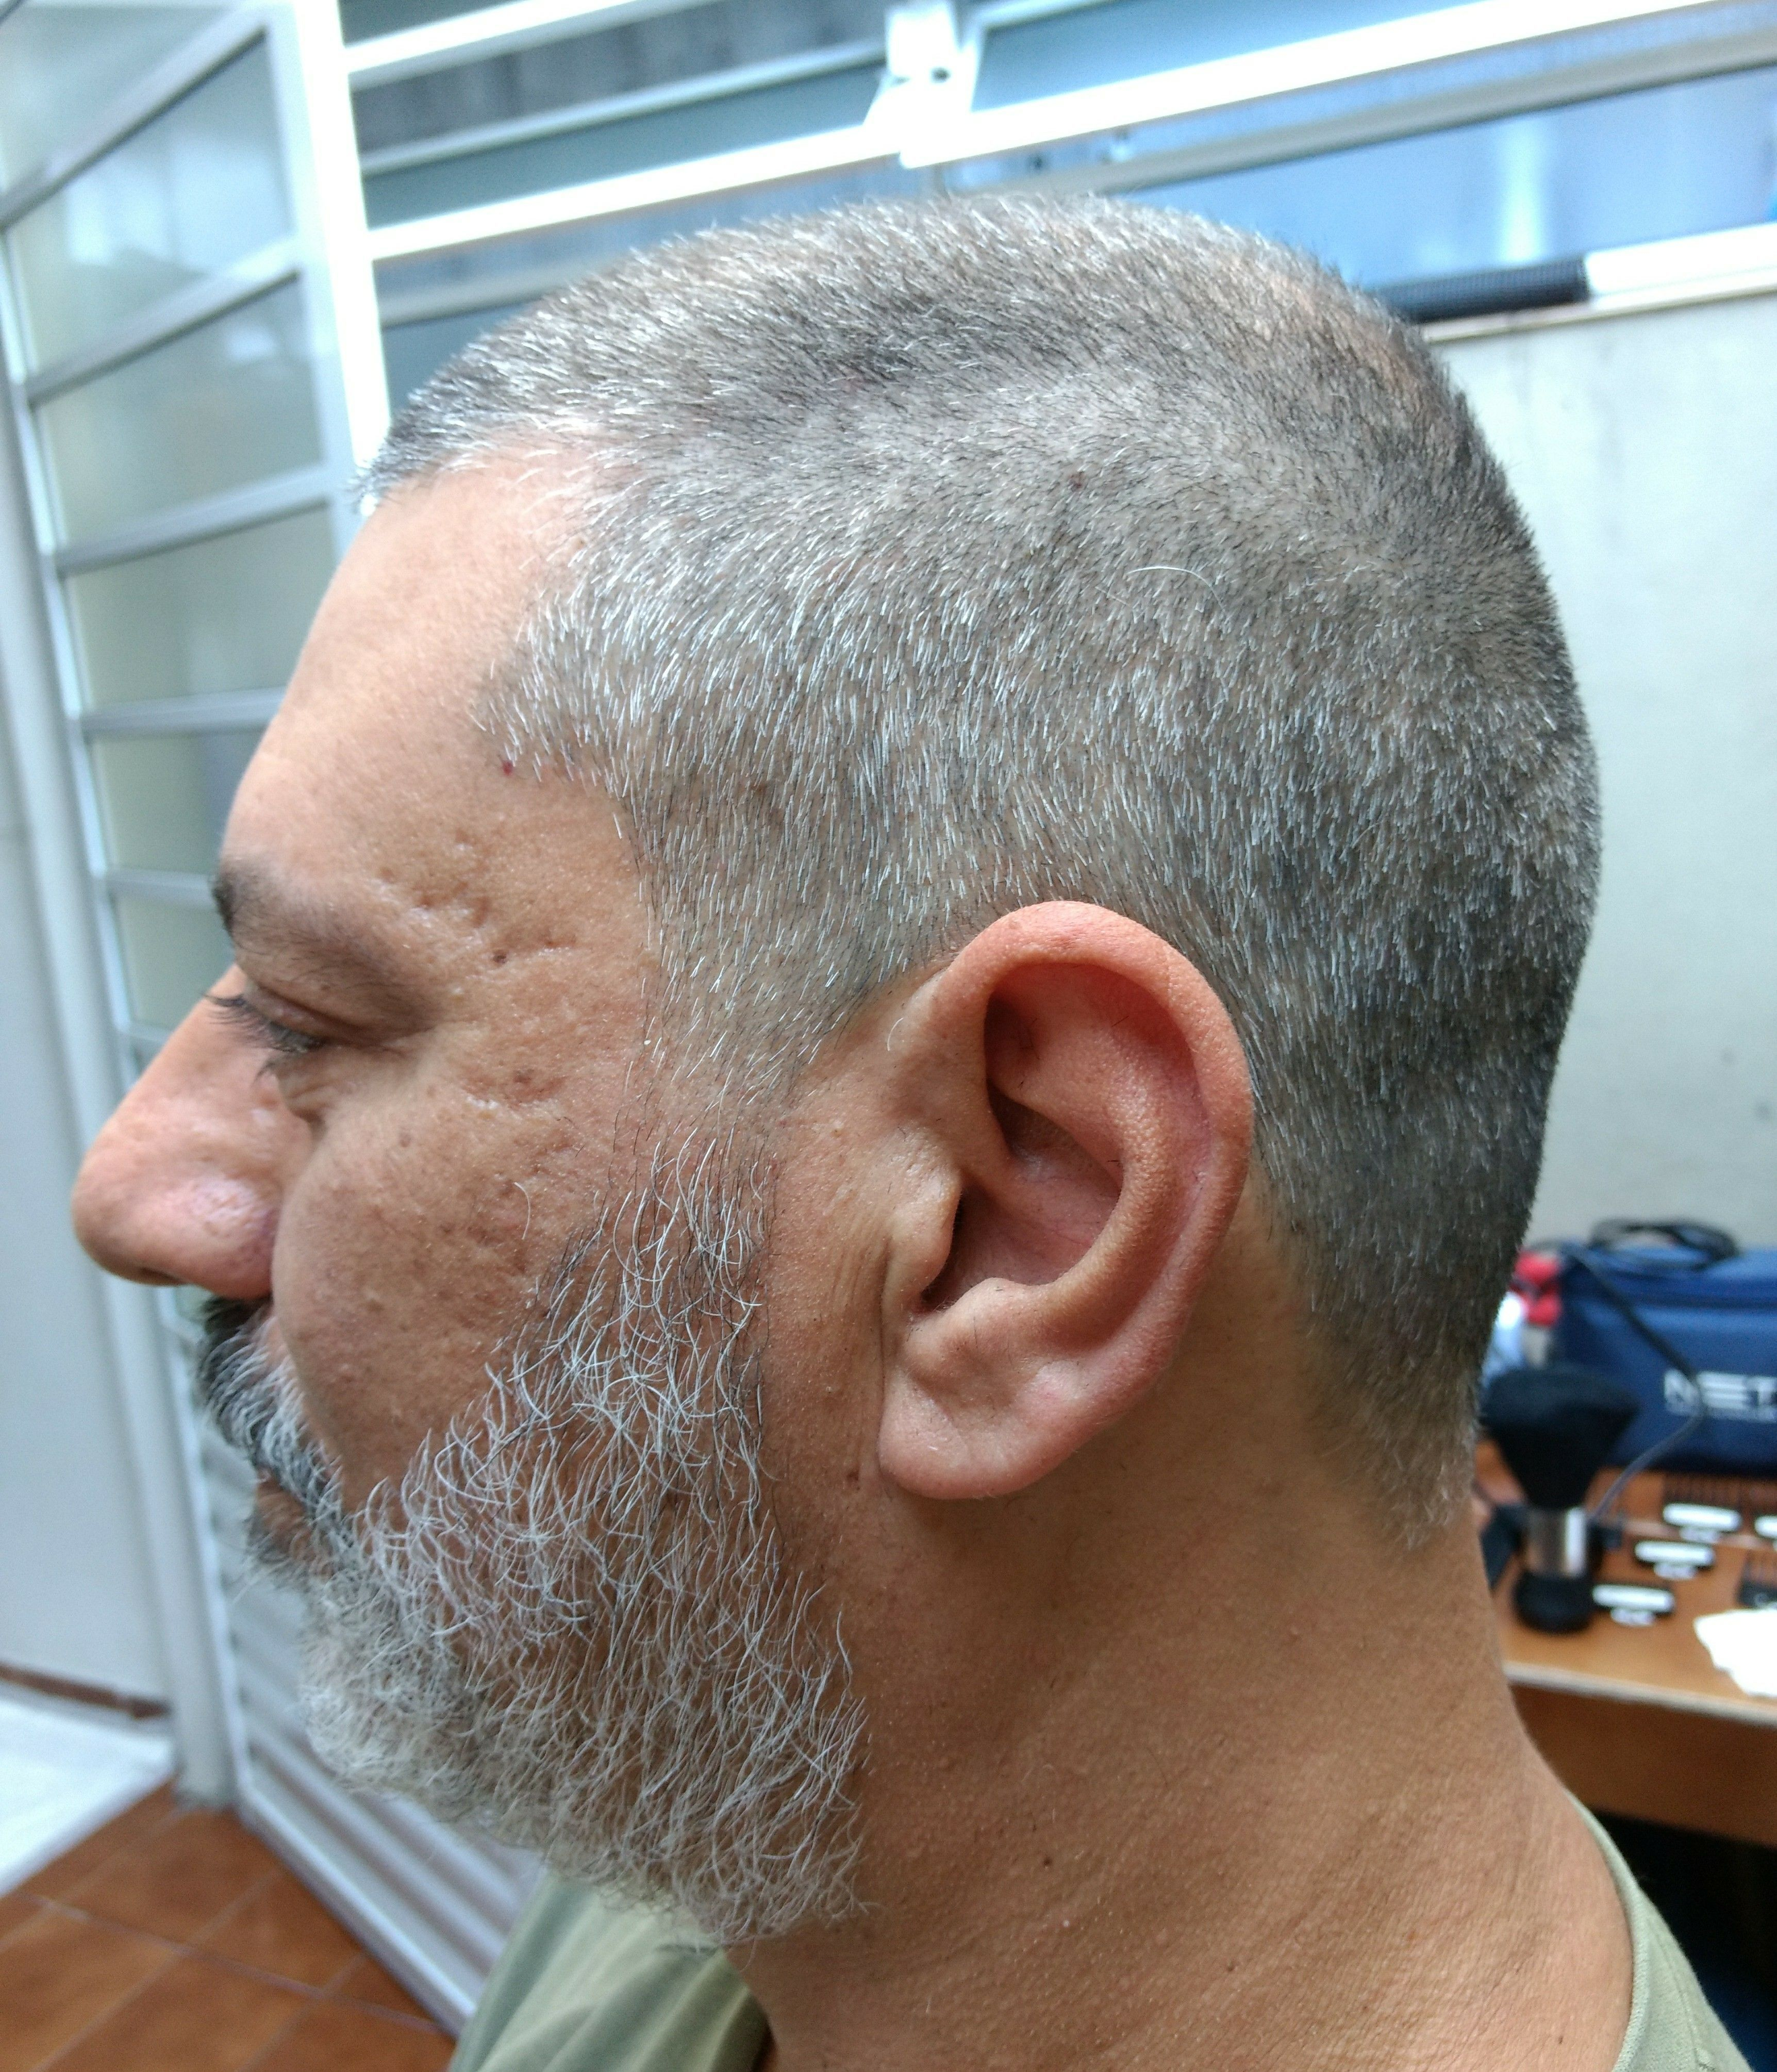 #barbeariatradicional #haircut #barber #barbearia #barbeiro #thebarberpost #hair #brasilbarbers #barbearias #barbers #barba #barbeirosbrasil #barbershop #wahl #hairstyle #cabelo #barbeariaclassica #barberlife outros barbeiro(a)